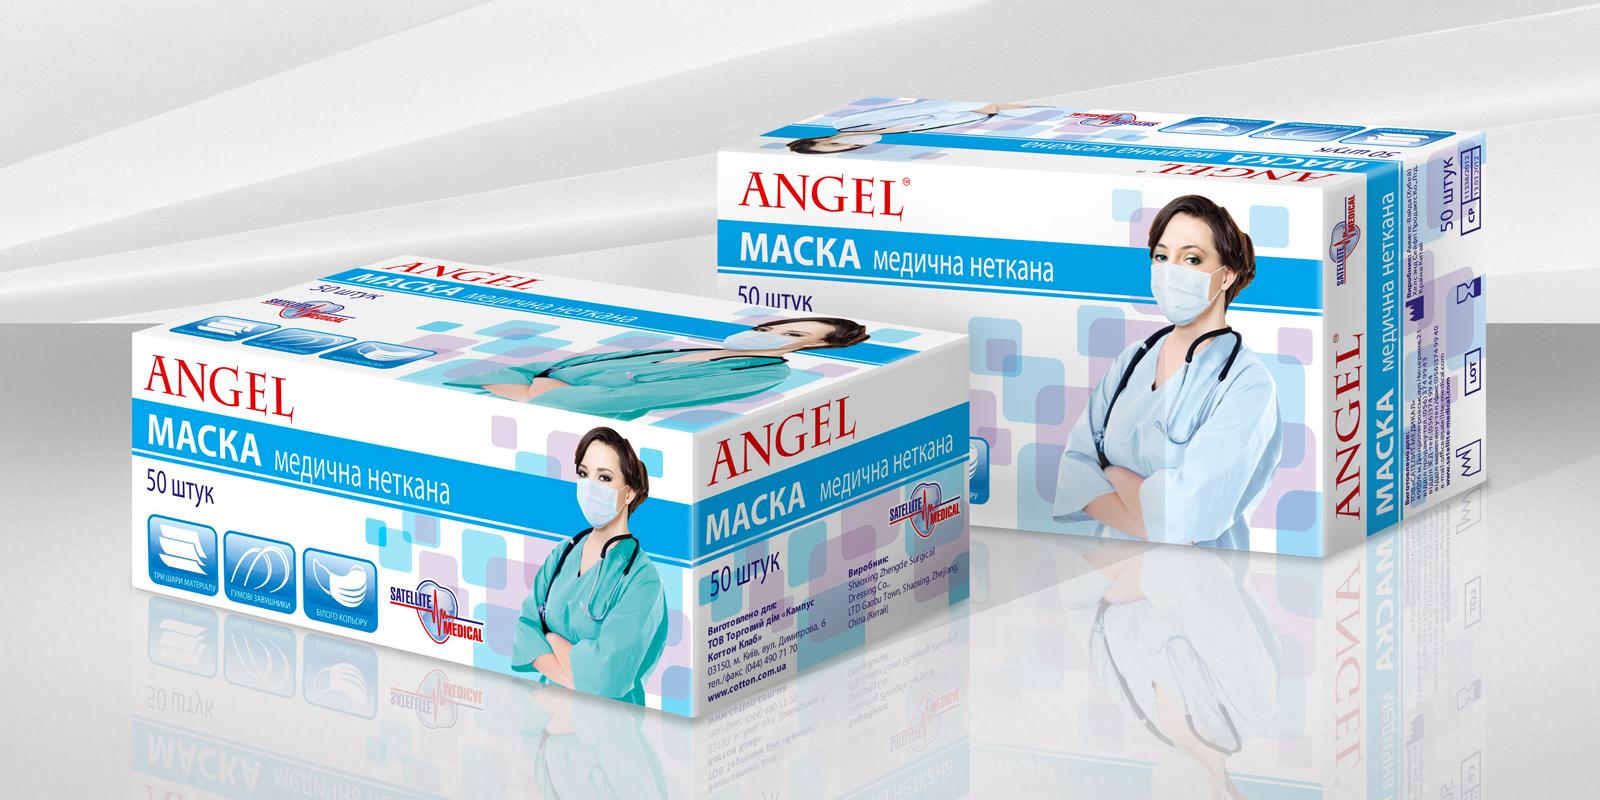 Satellite Medical;;;;;;Разработка дизайна упаковки;;;;;;<span>Клиент:</span> Satellite Medical;;;;;;;;;;;;Разработка дизайна упаковки;;;;;; 2 ;;;;;;